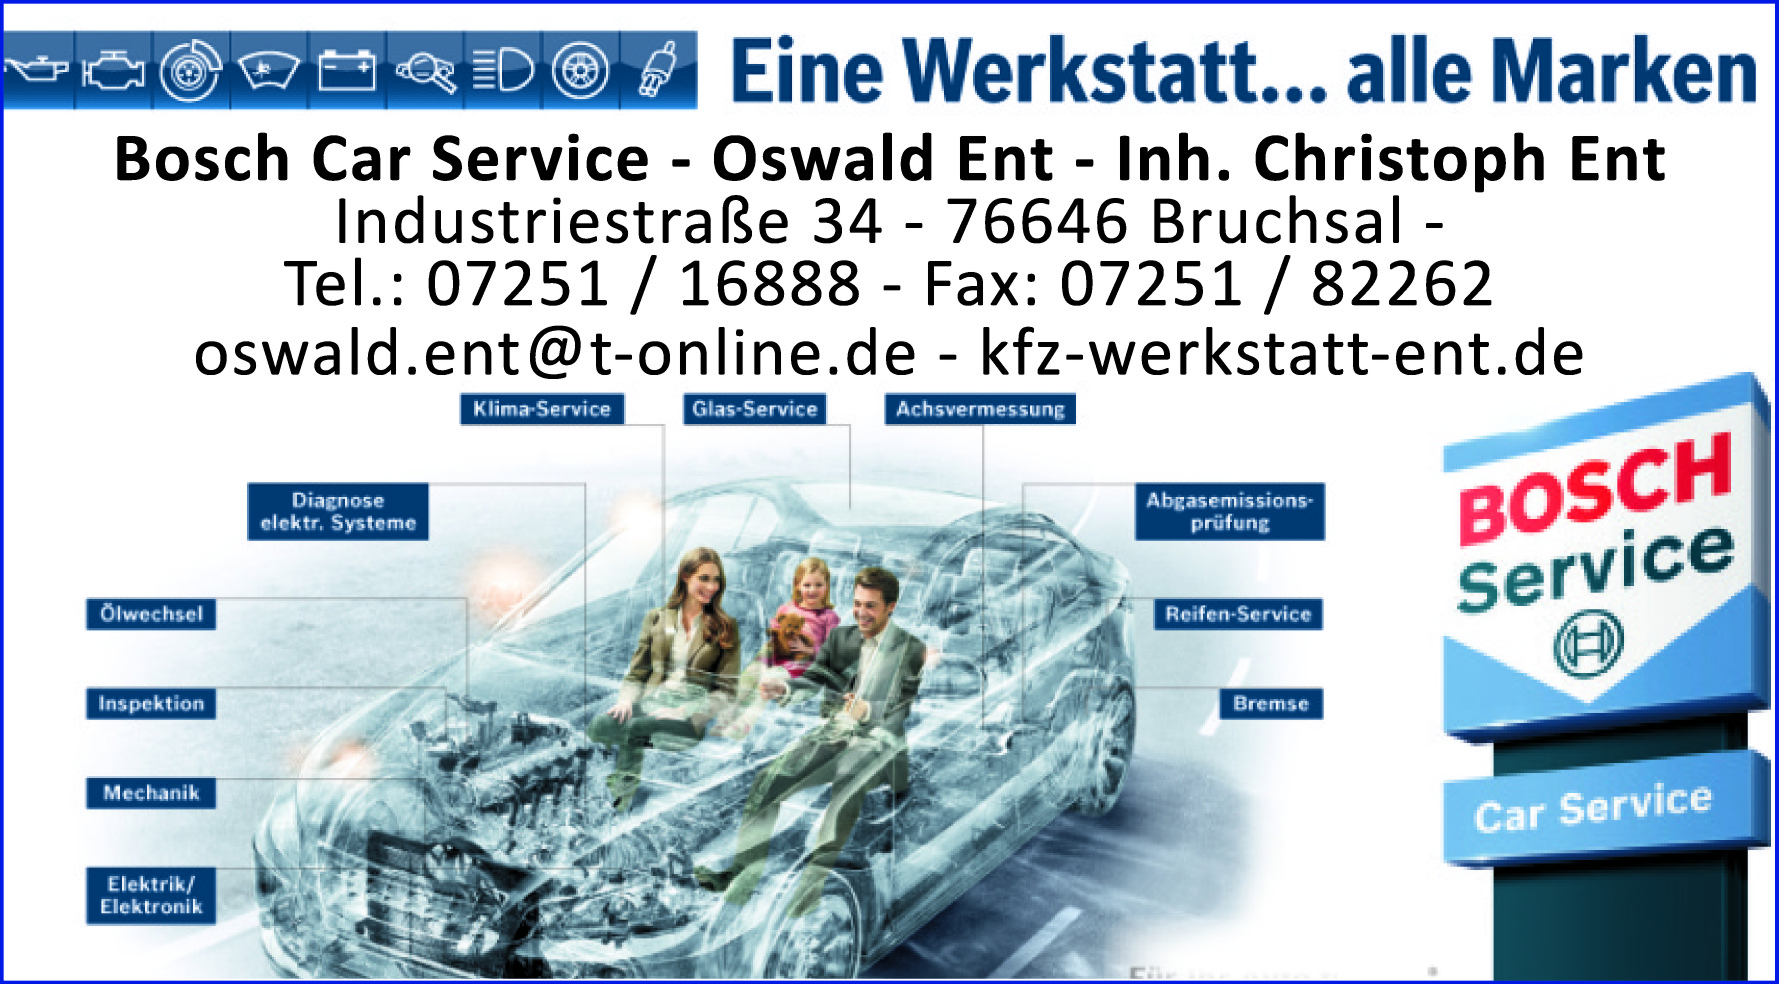 Bosch Car Service – Oswald Ent